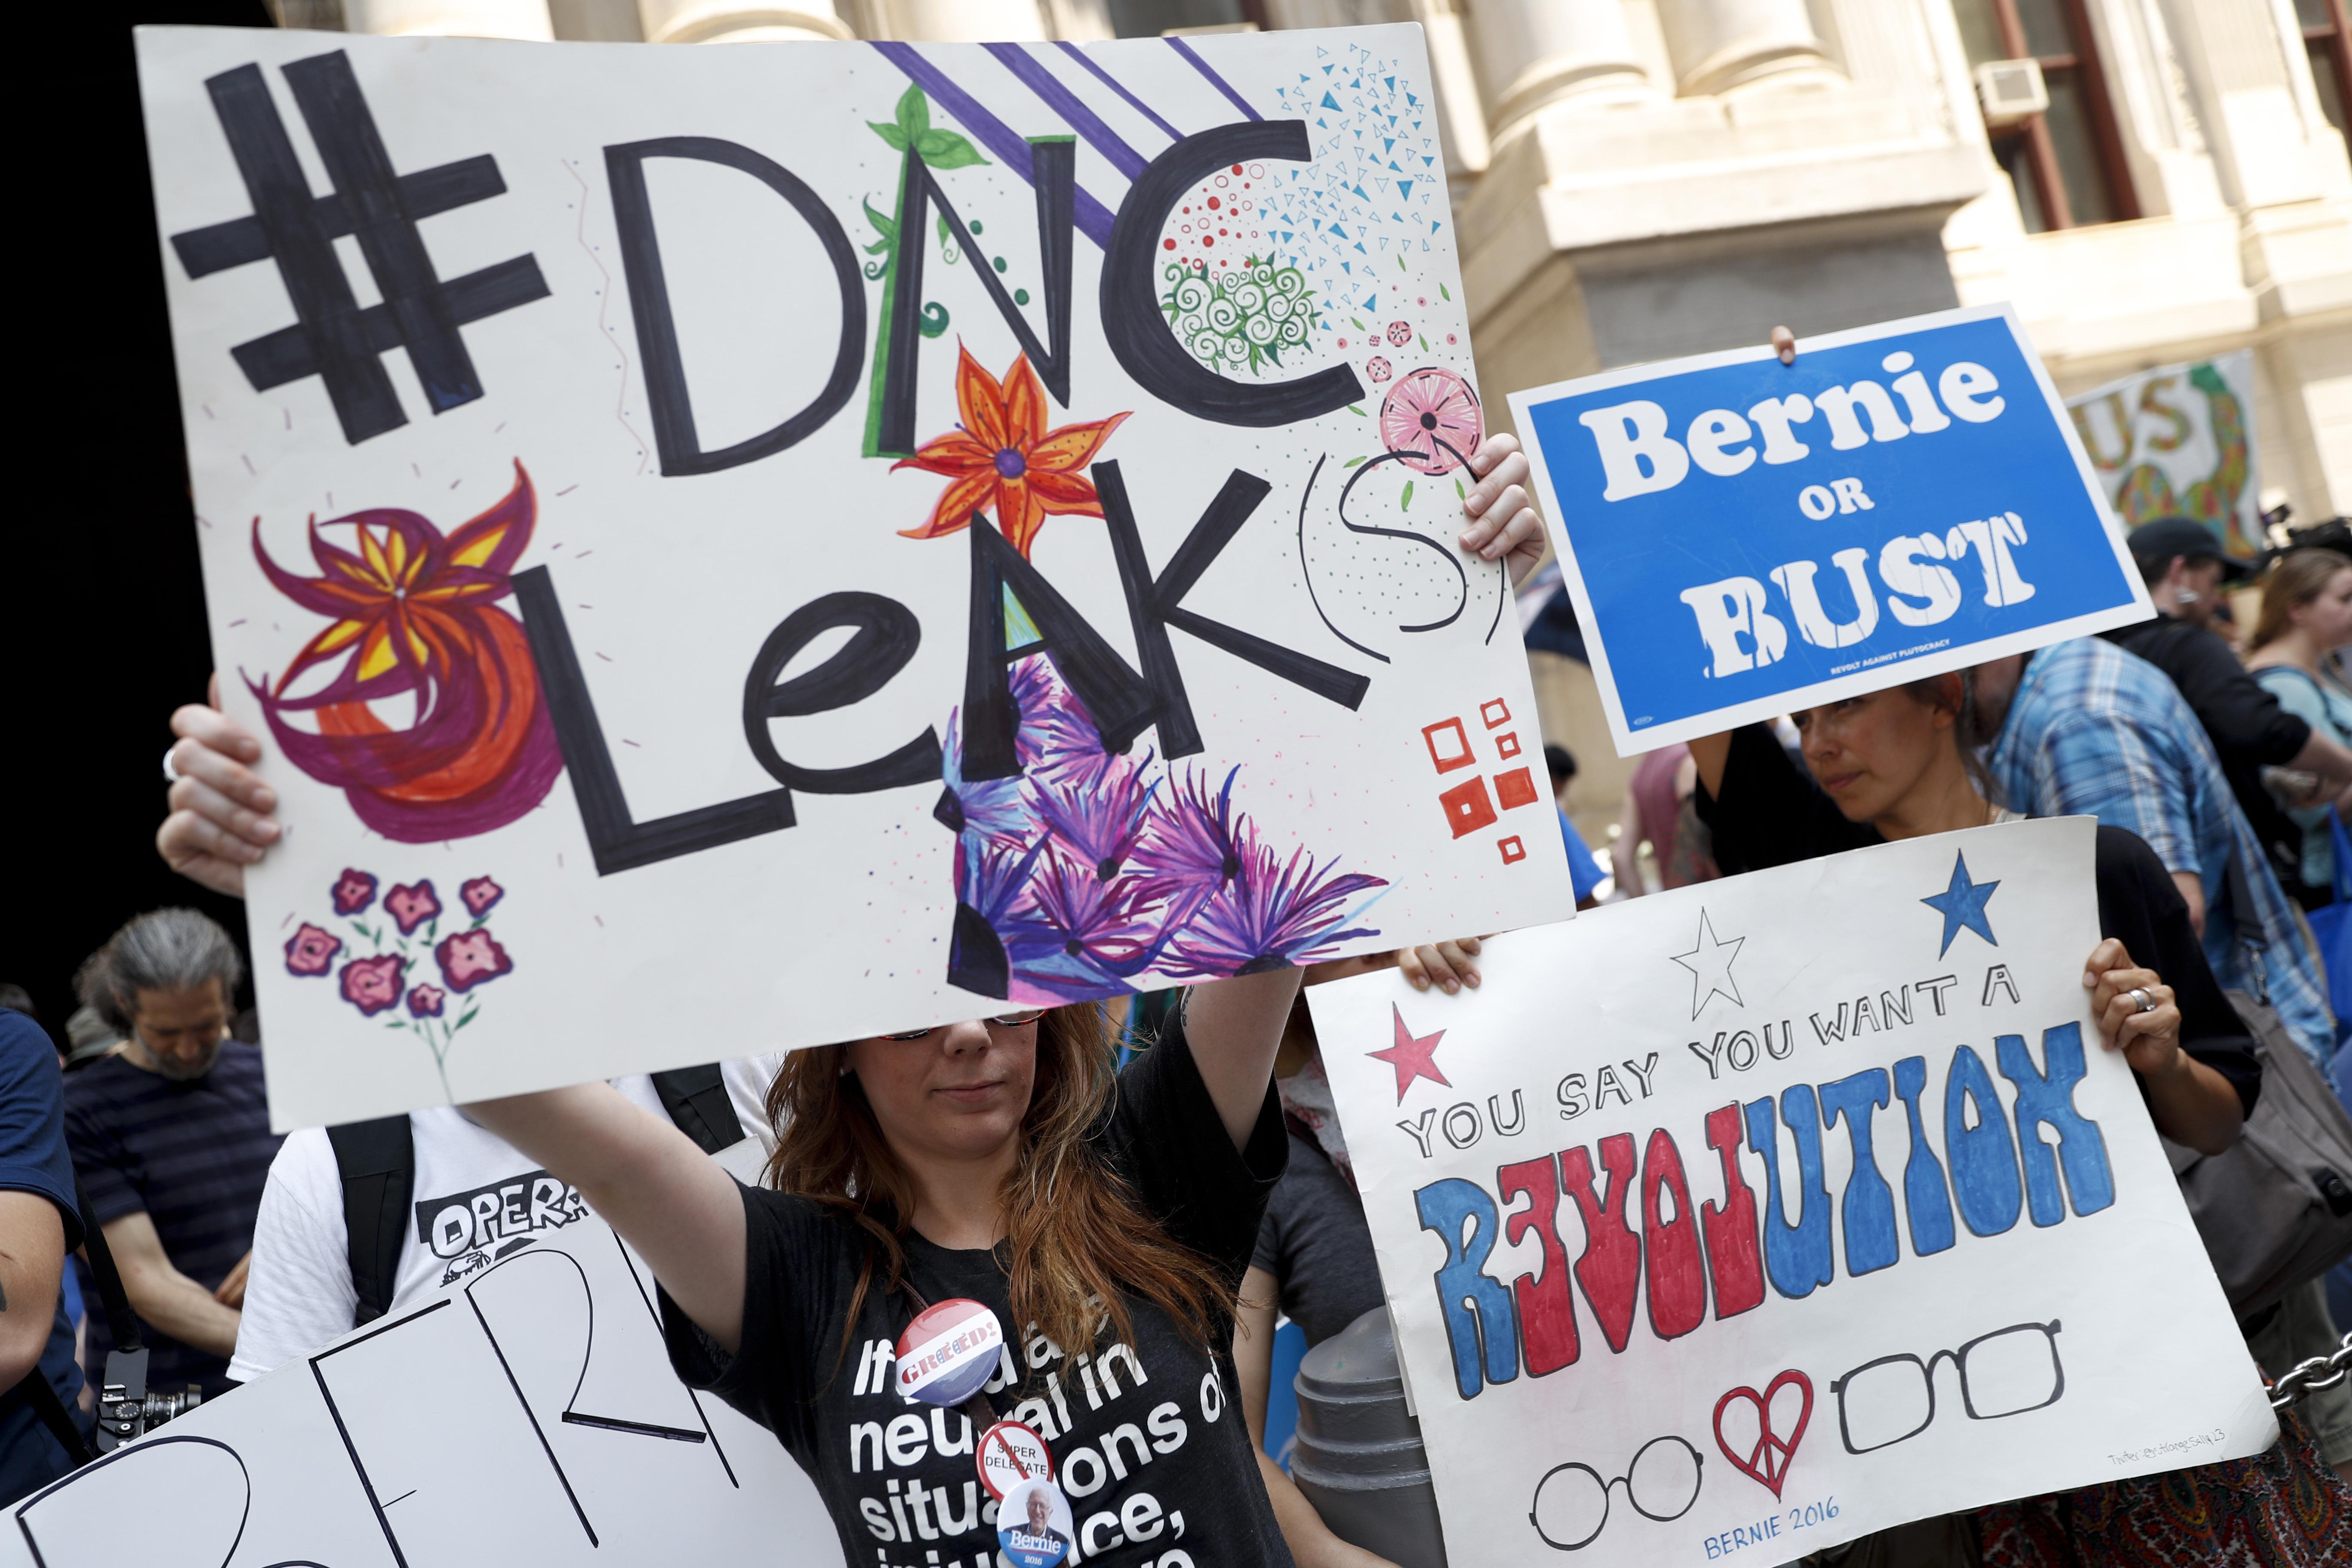 Russia Hacks DNC Emails